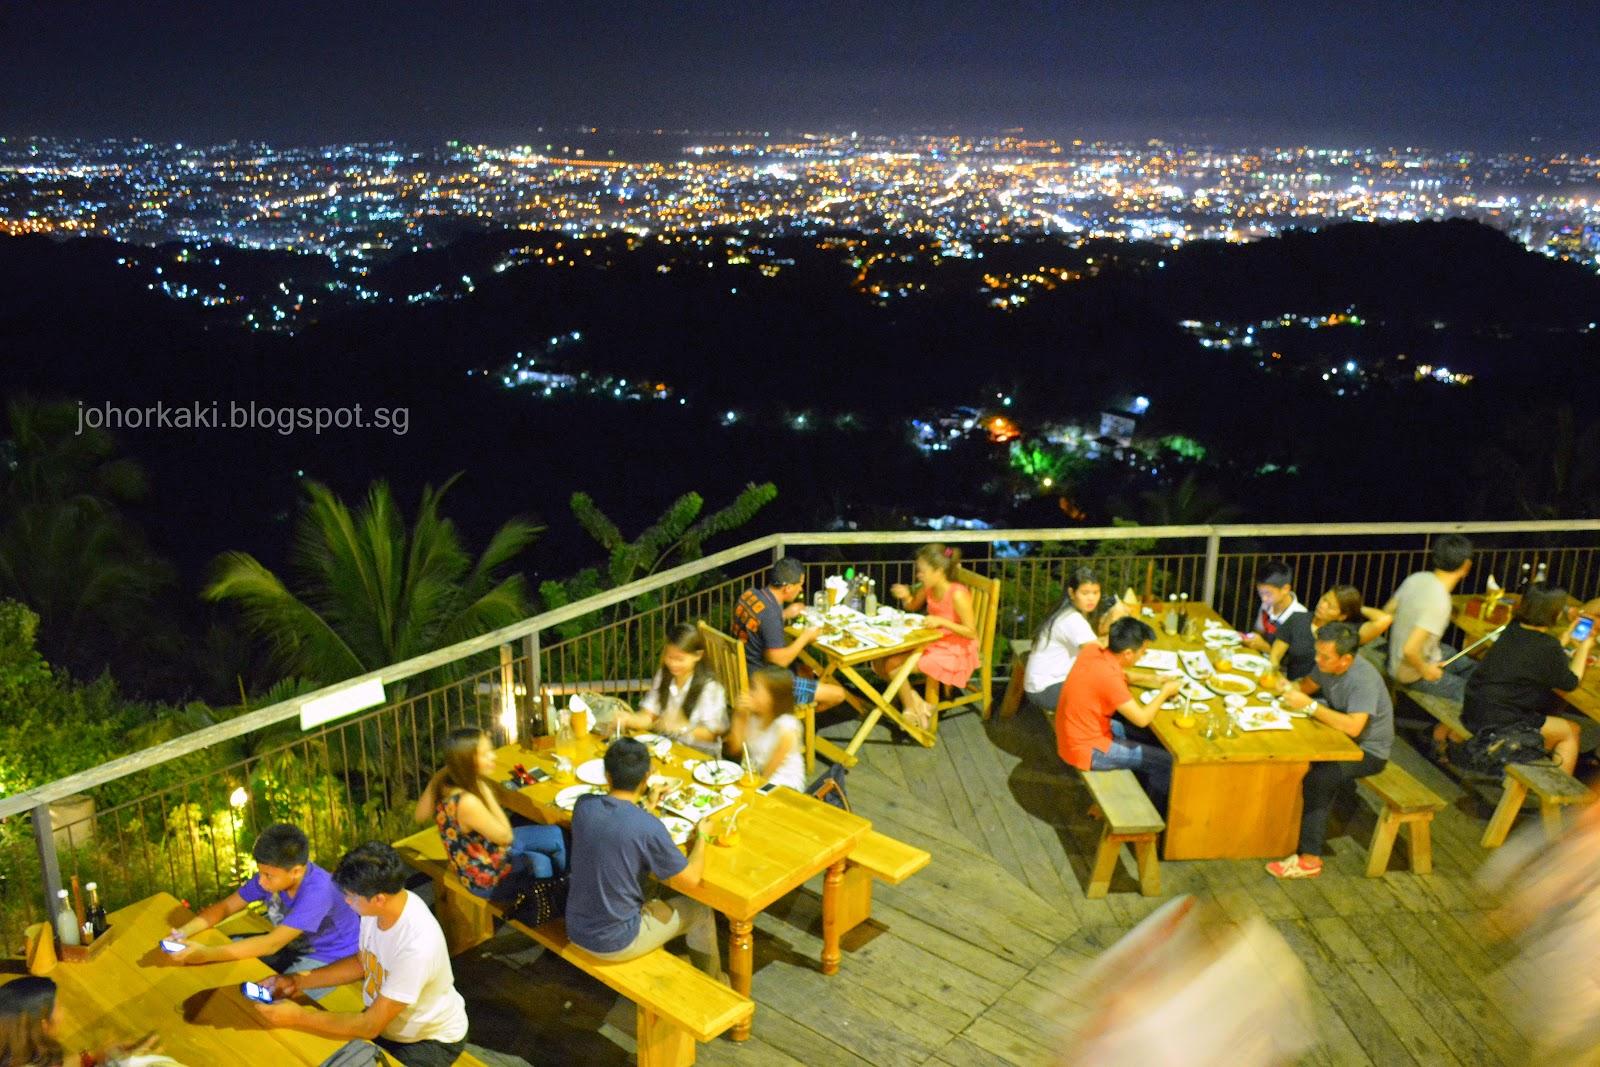 Lantaw Native Restaurant Busay Cebu Philippines Johor Kaki Travels For Food